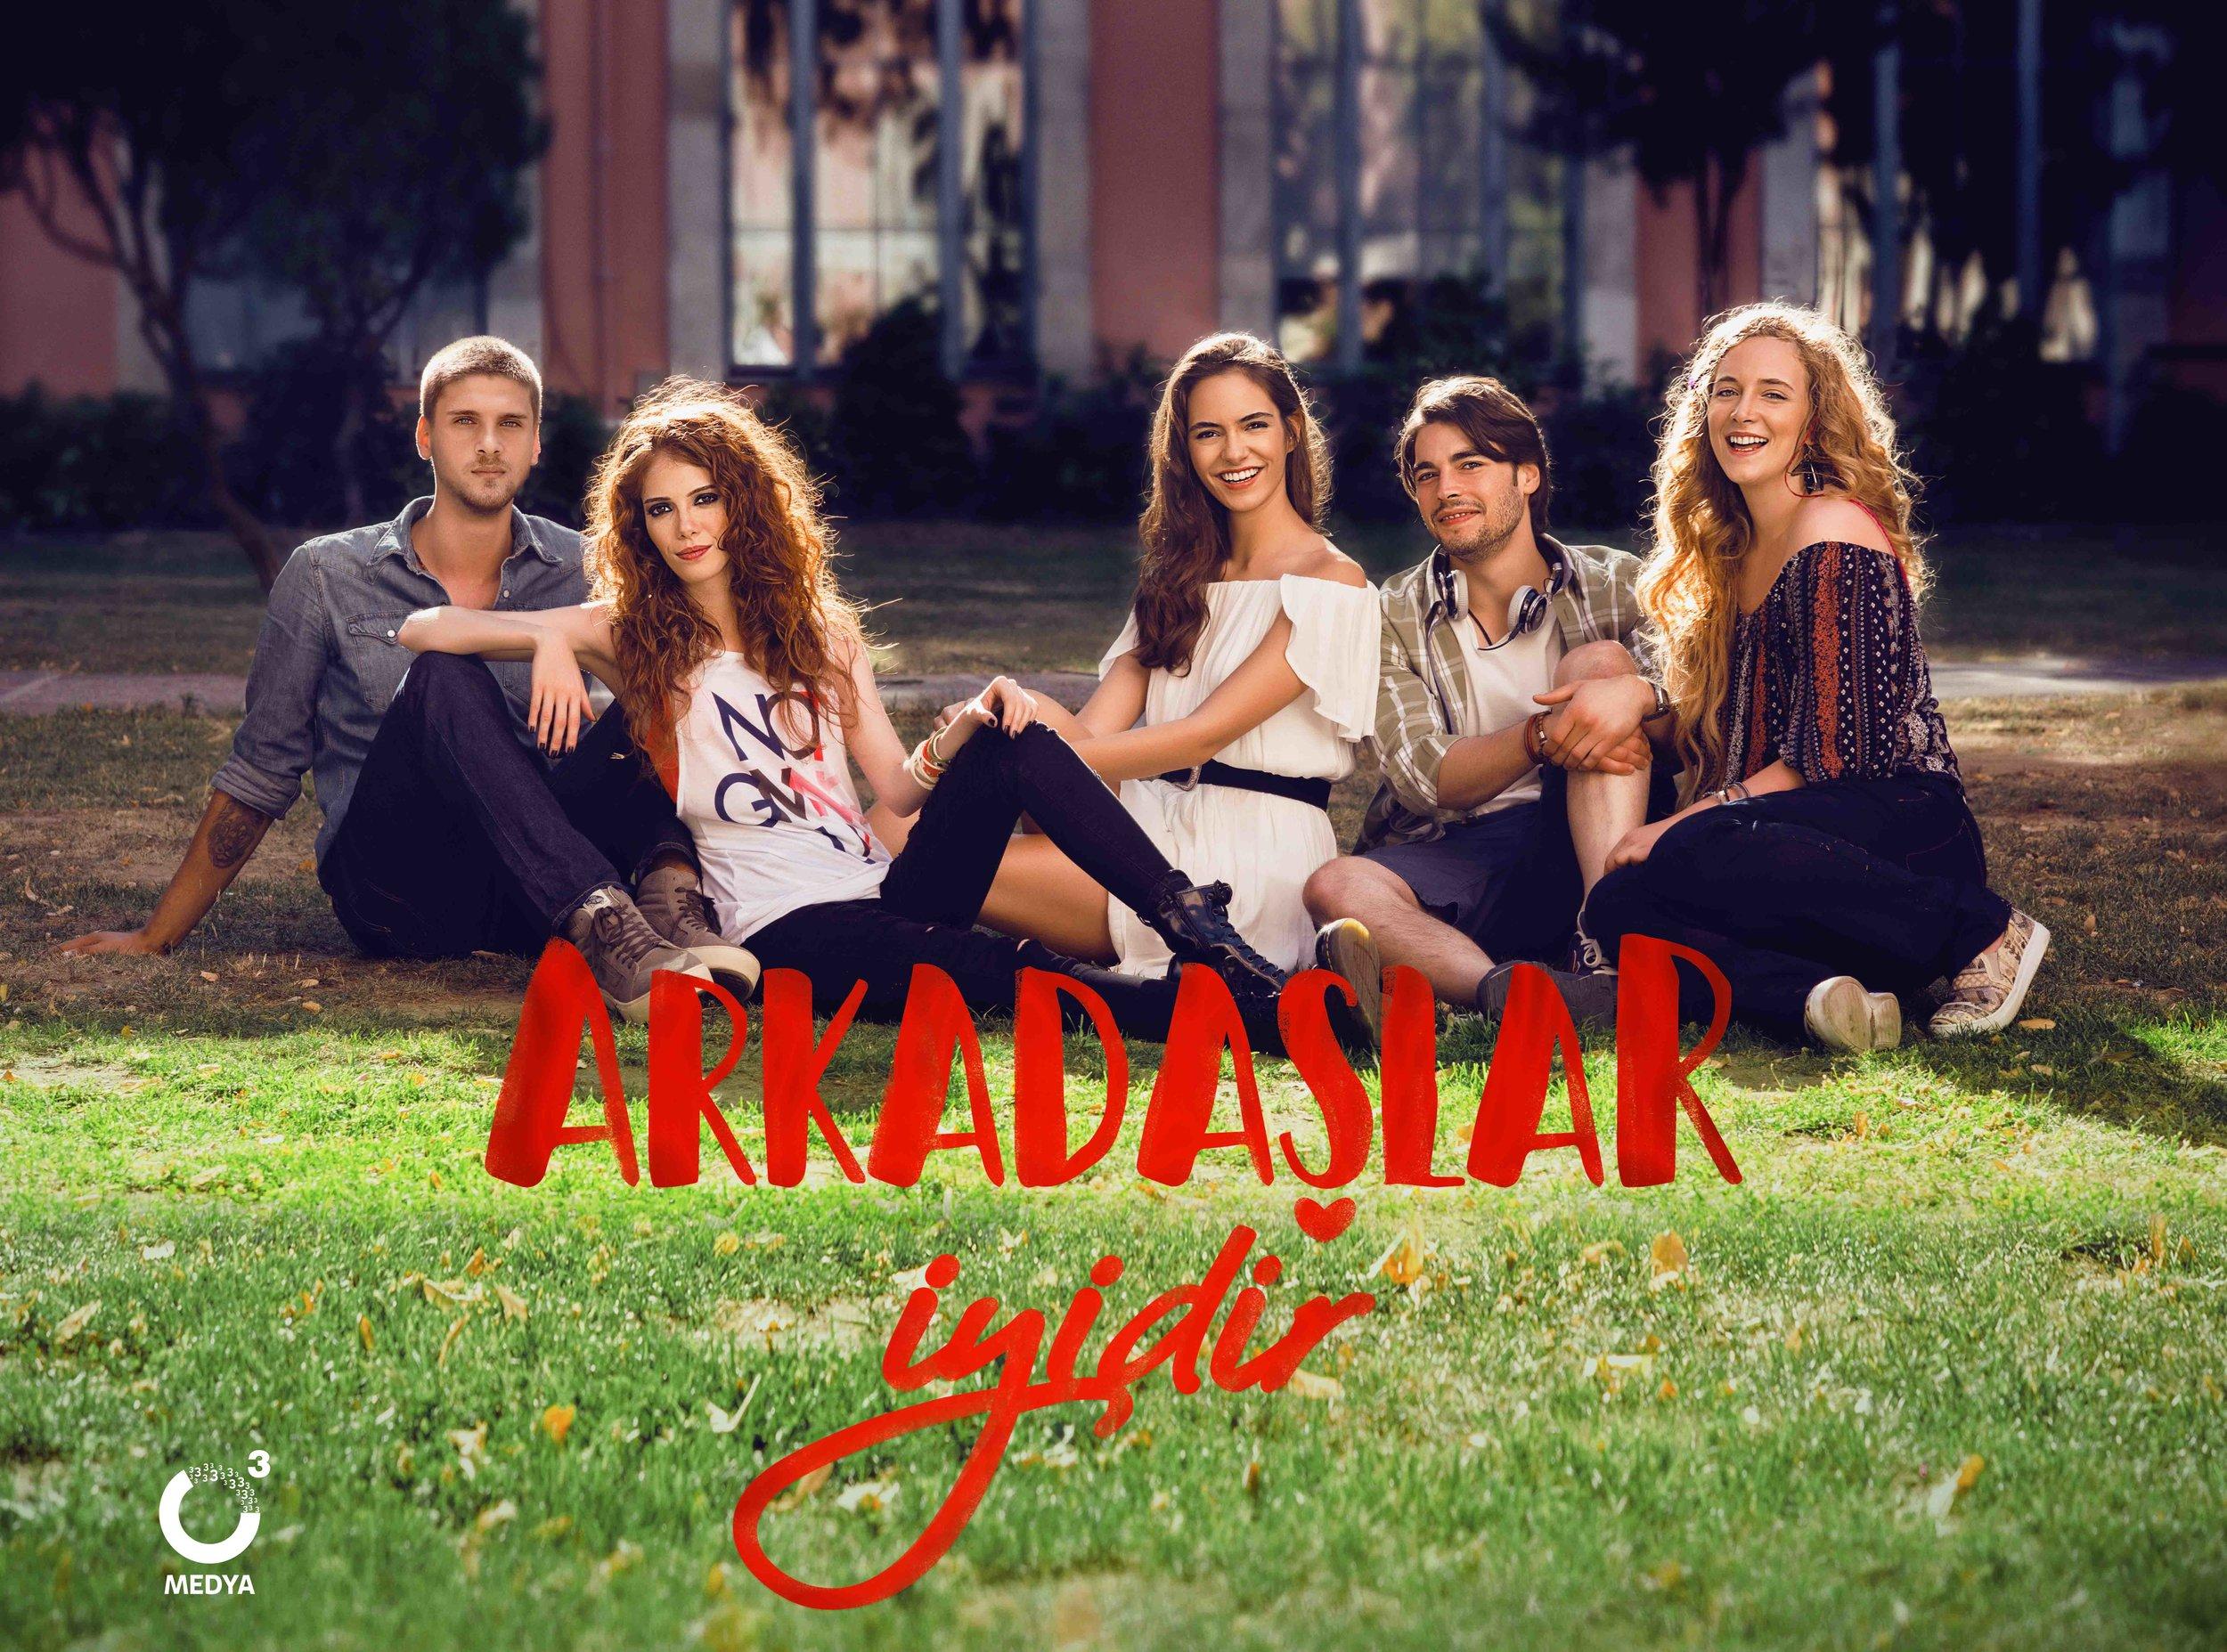 ARKADASLAR_ANAAFIS_FINAL_YATAY.jpg